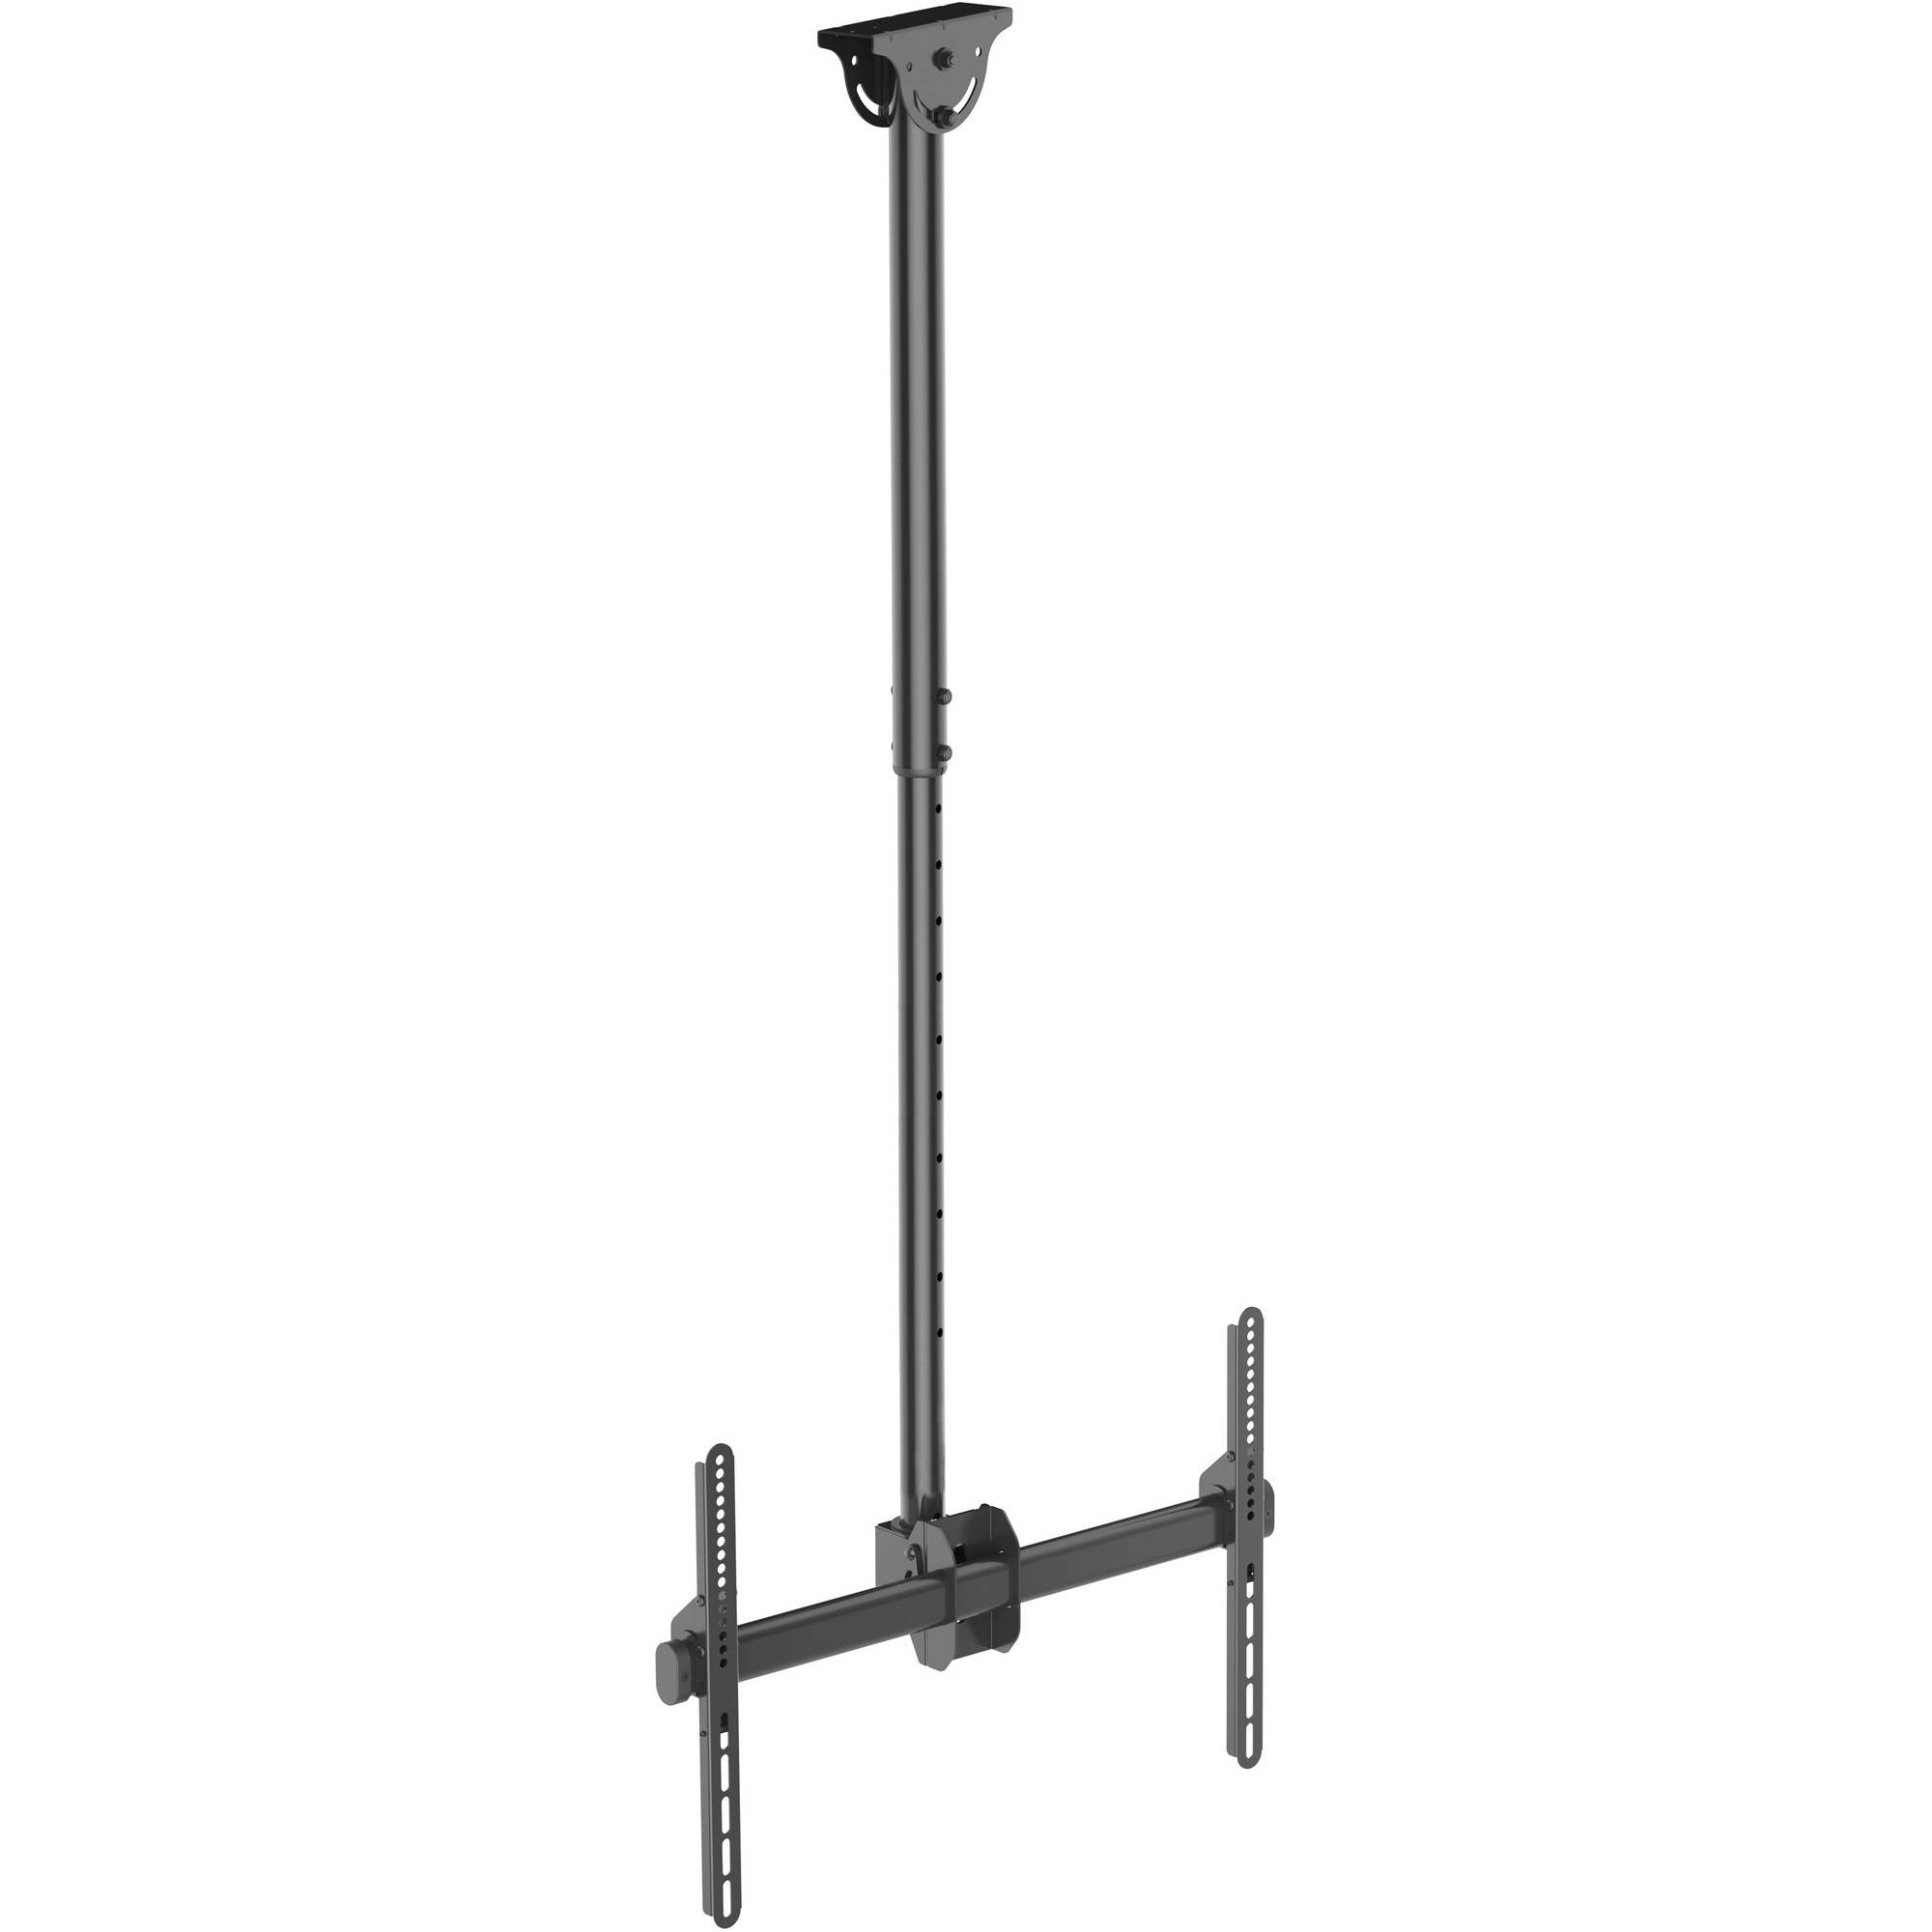 Tuff Mount Pro Series C7027 Ceiling Mount for 37″ to 80″ HDTVs, Black